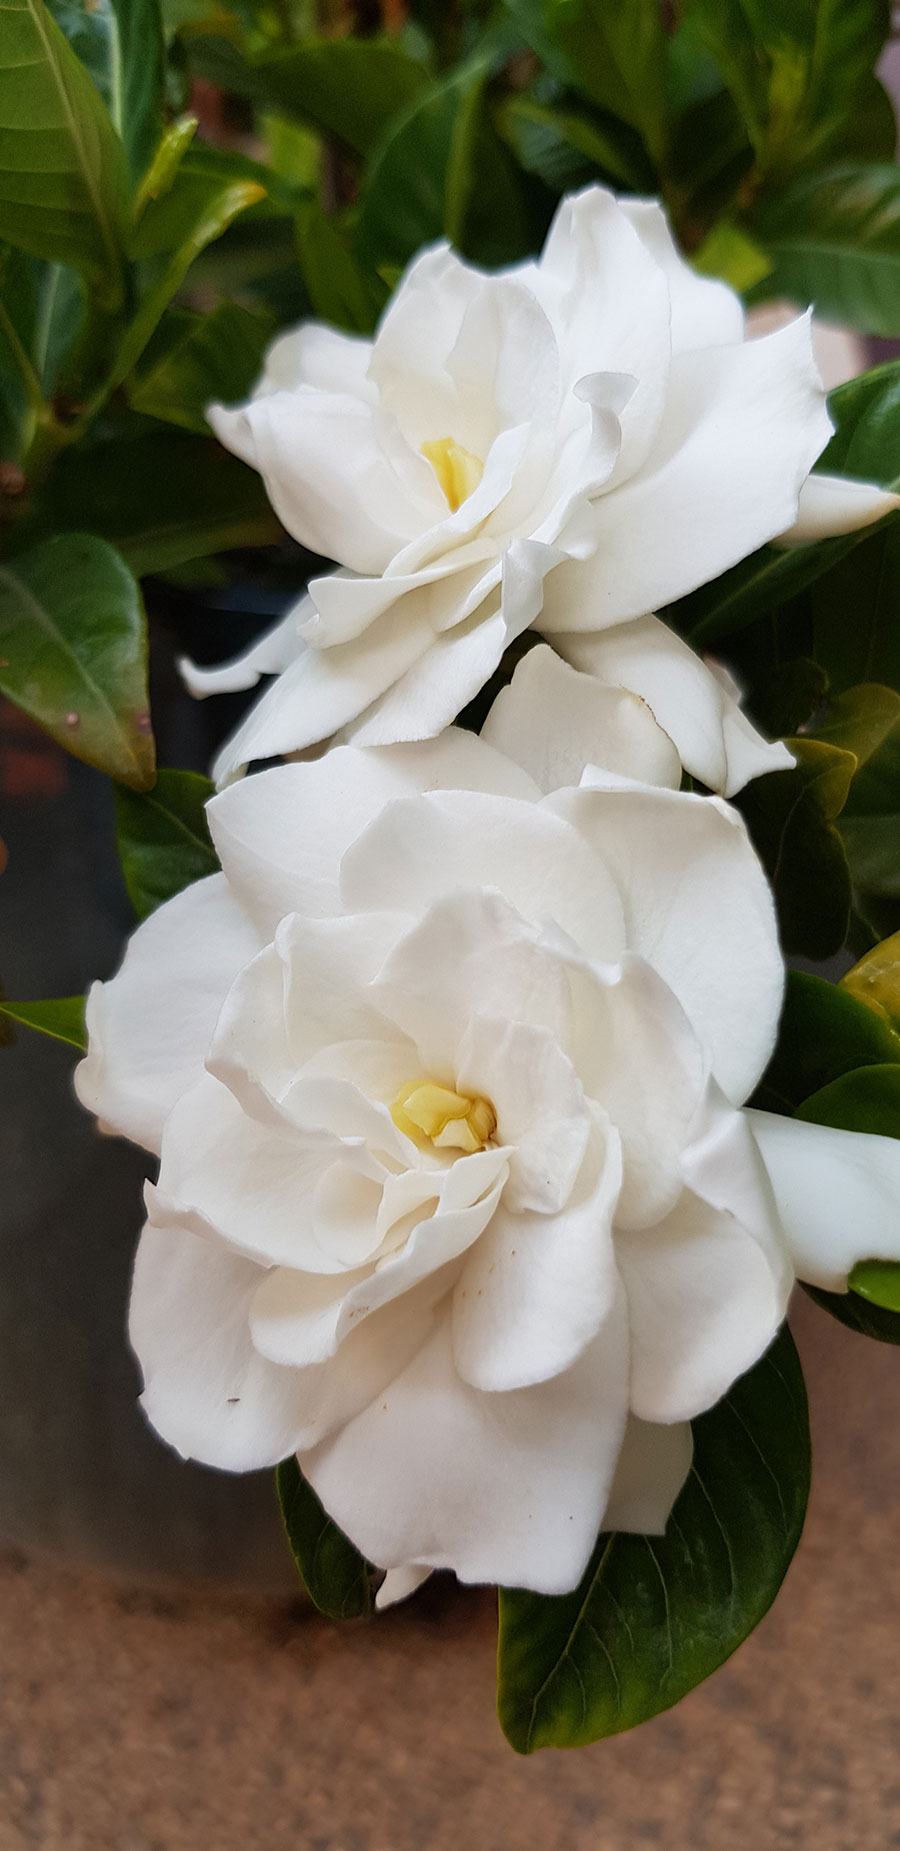 Meditation flower2